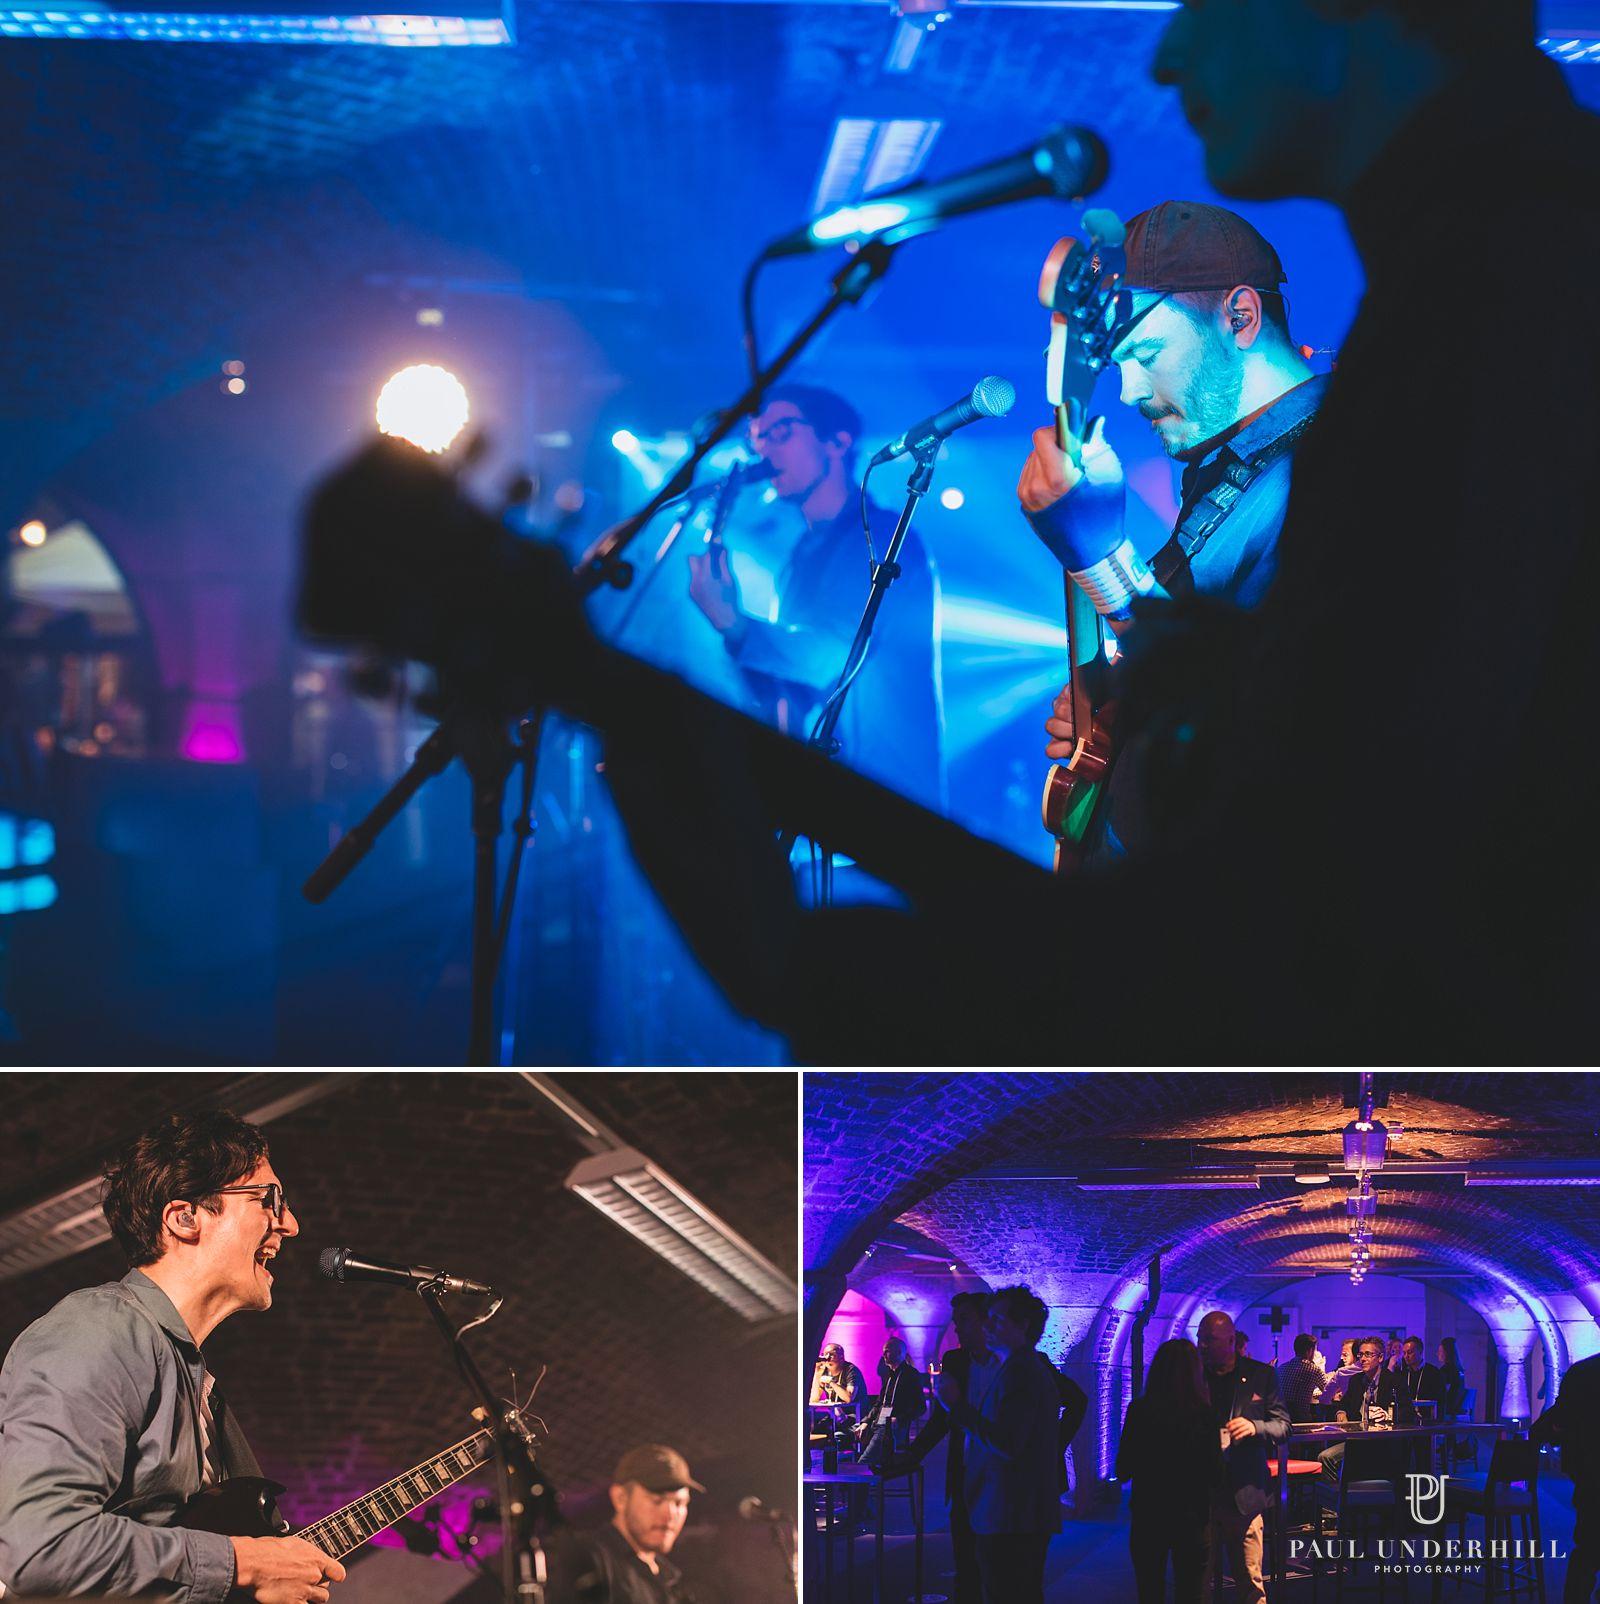 Live band at Tabacco Dock London